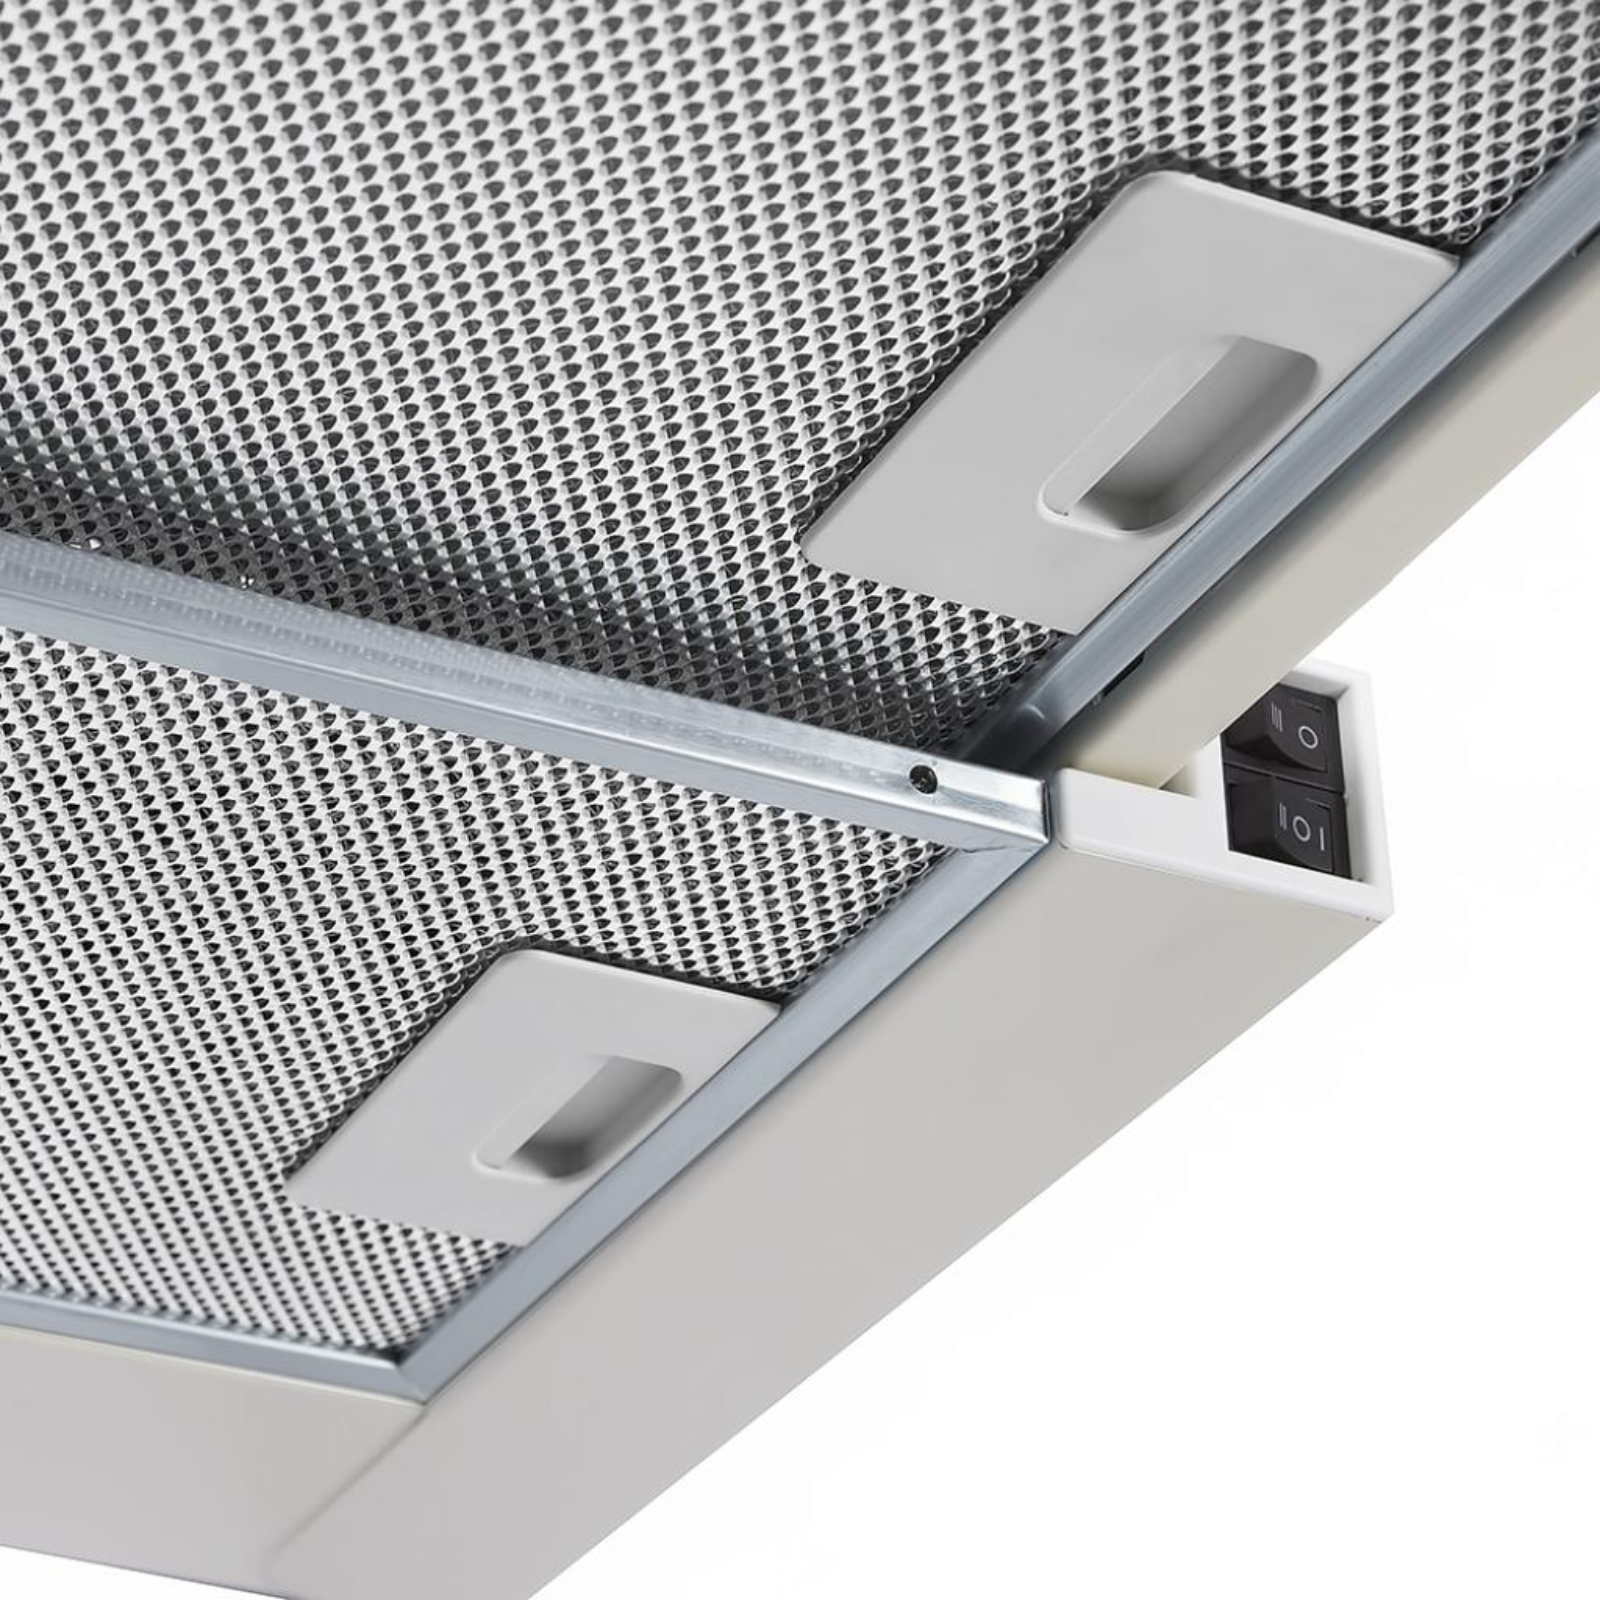 Вытяжка кухонная PERFELLI TL 5103 IV LED изображение 4